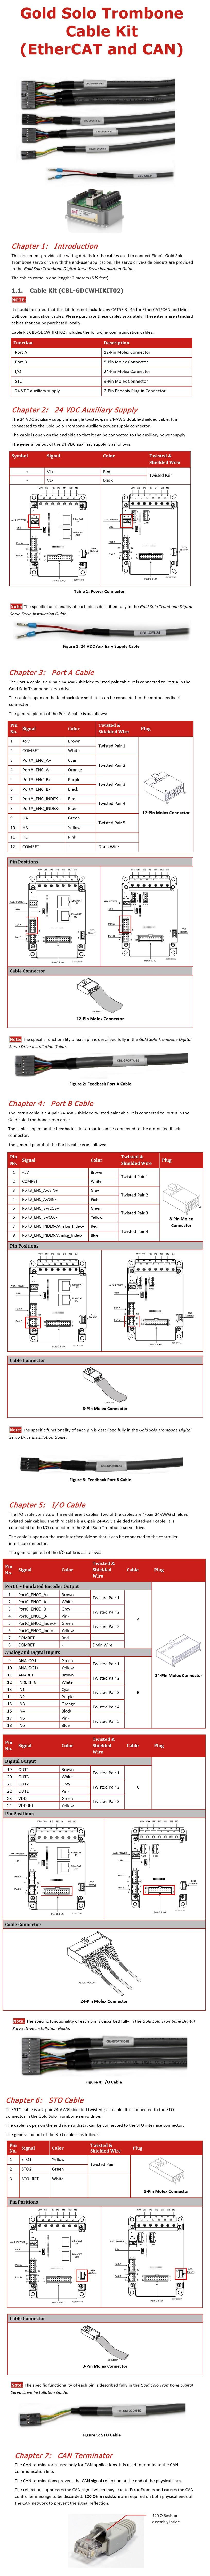 Gold Solo Trombone Cable Kit elmo motion control gold solo trombone cable kit